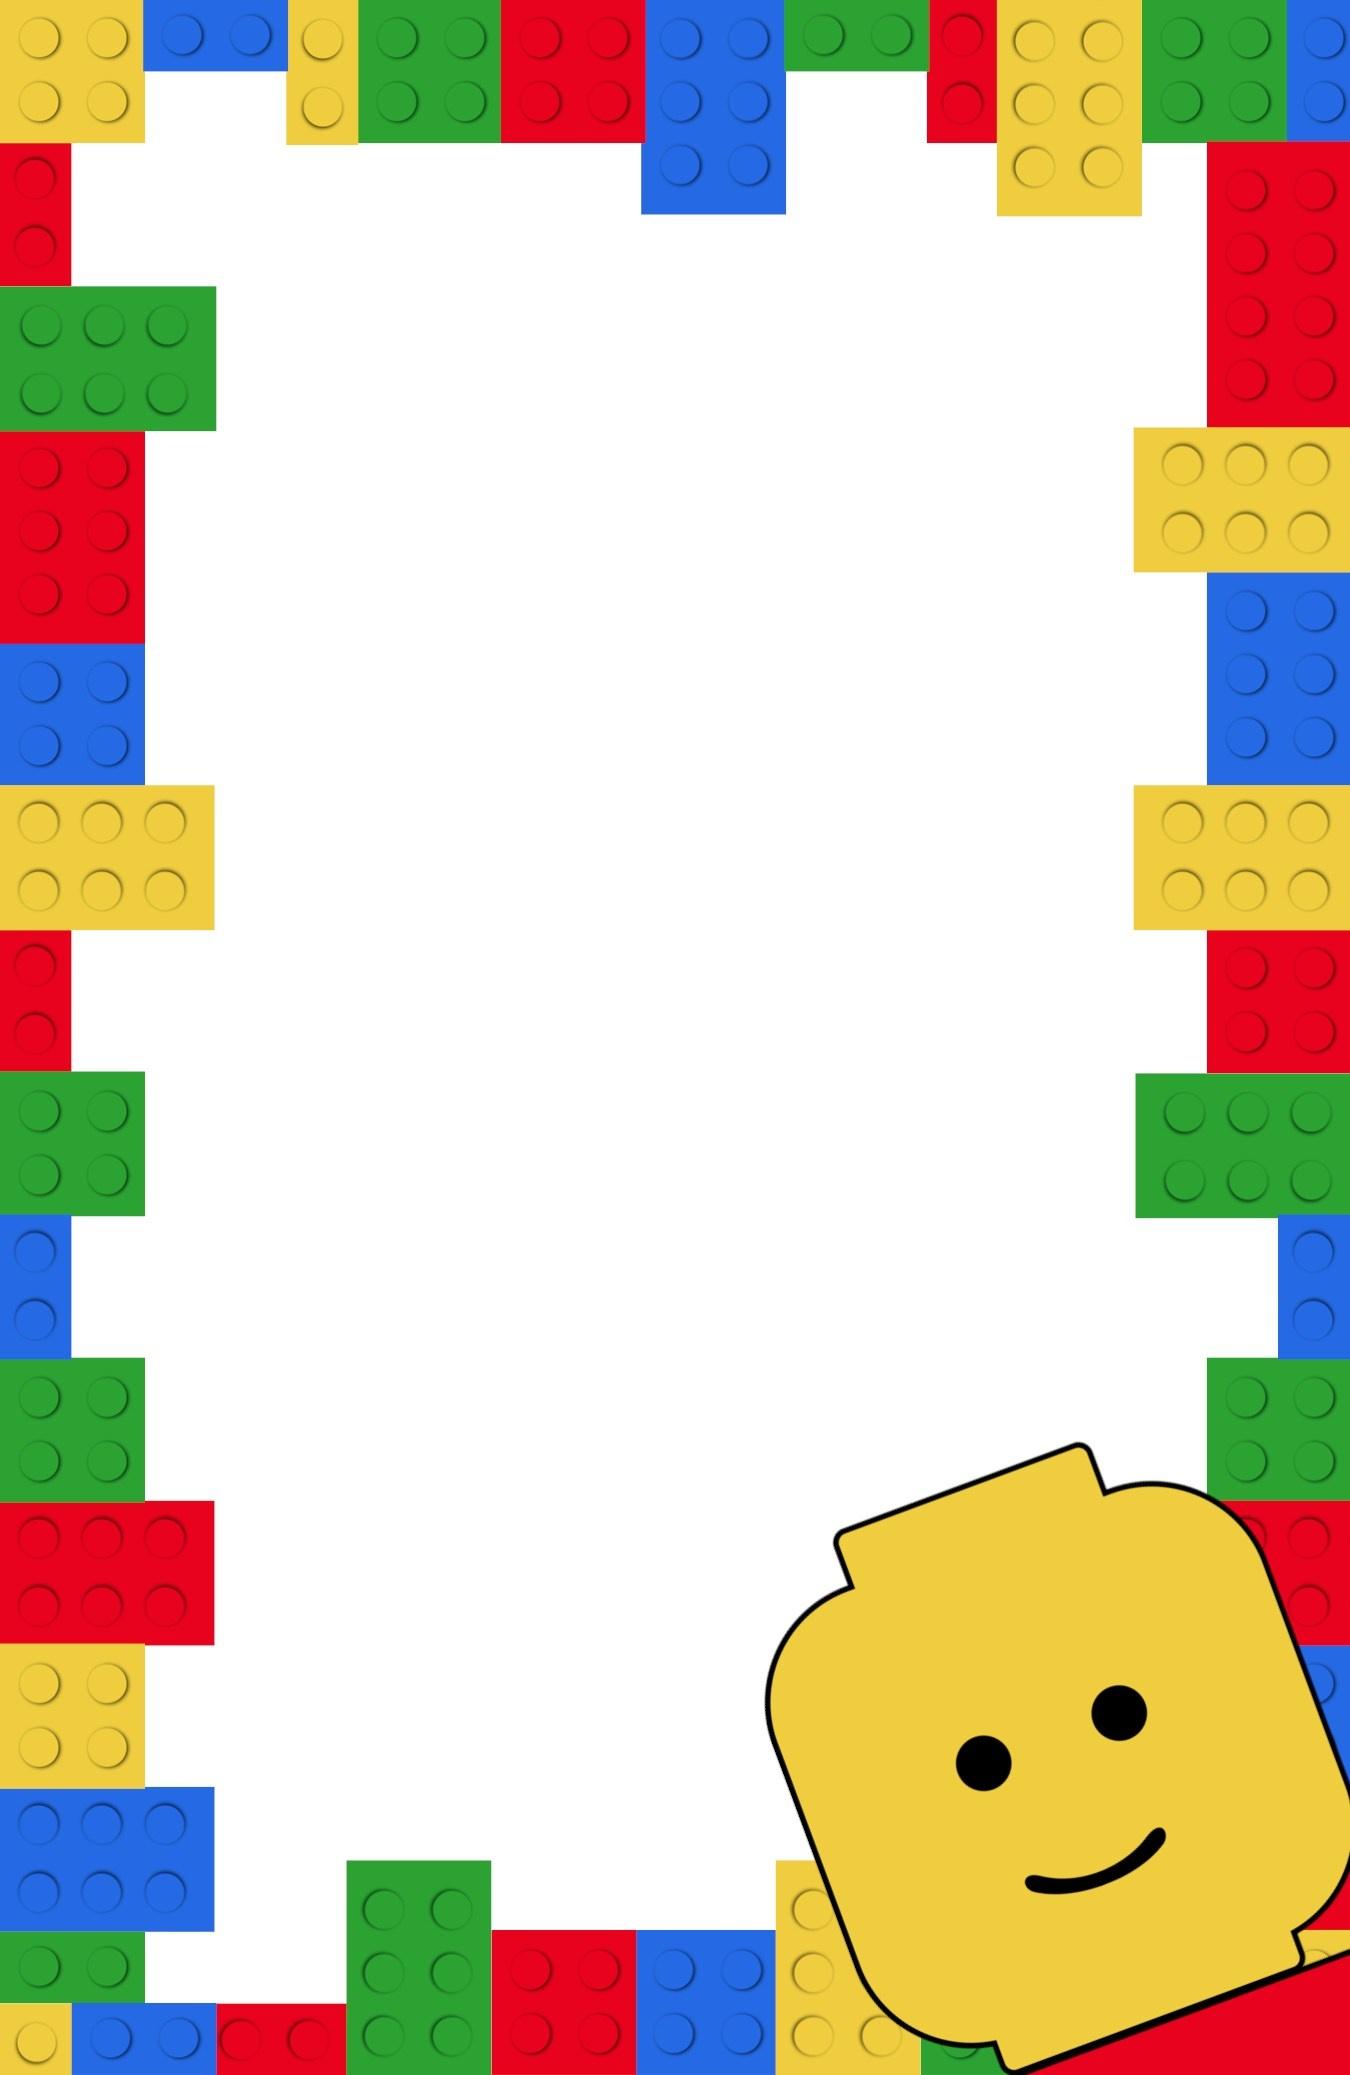 Free Printable Lego Birthday Party Invitation Template - Paper Trail - Lego Party Invitations Printable Free